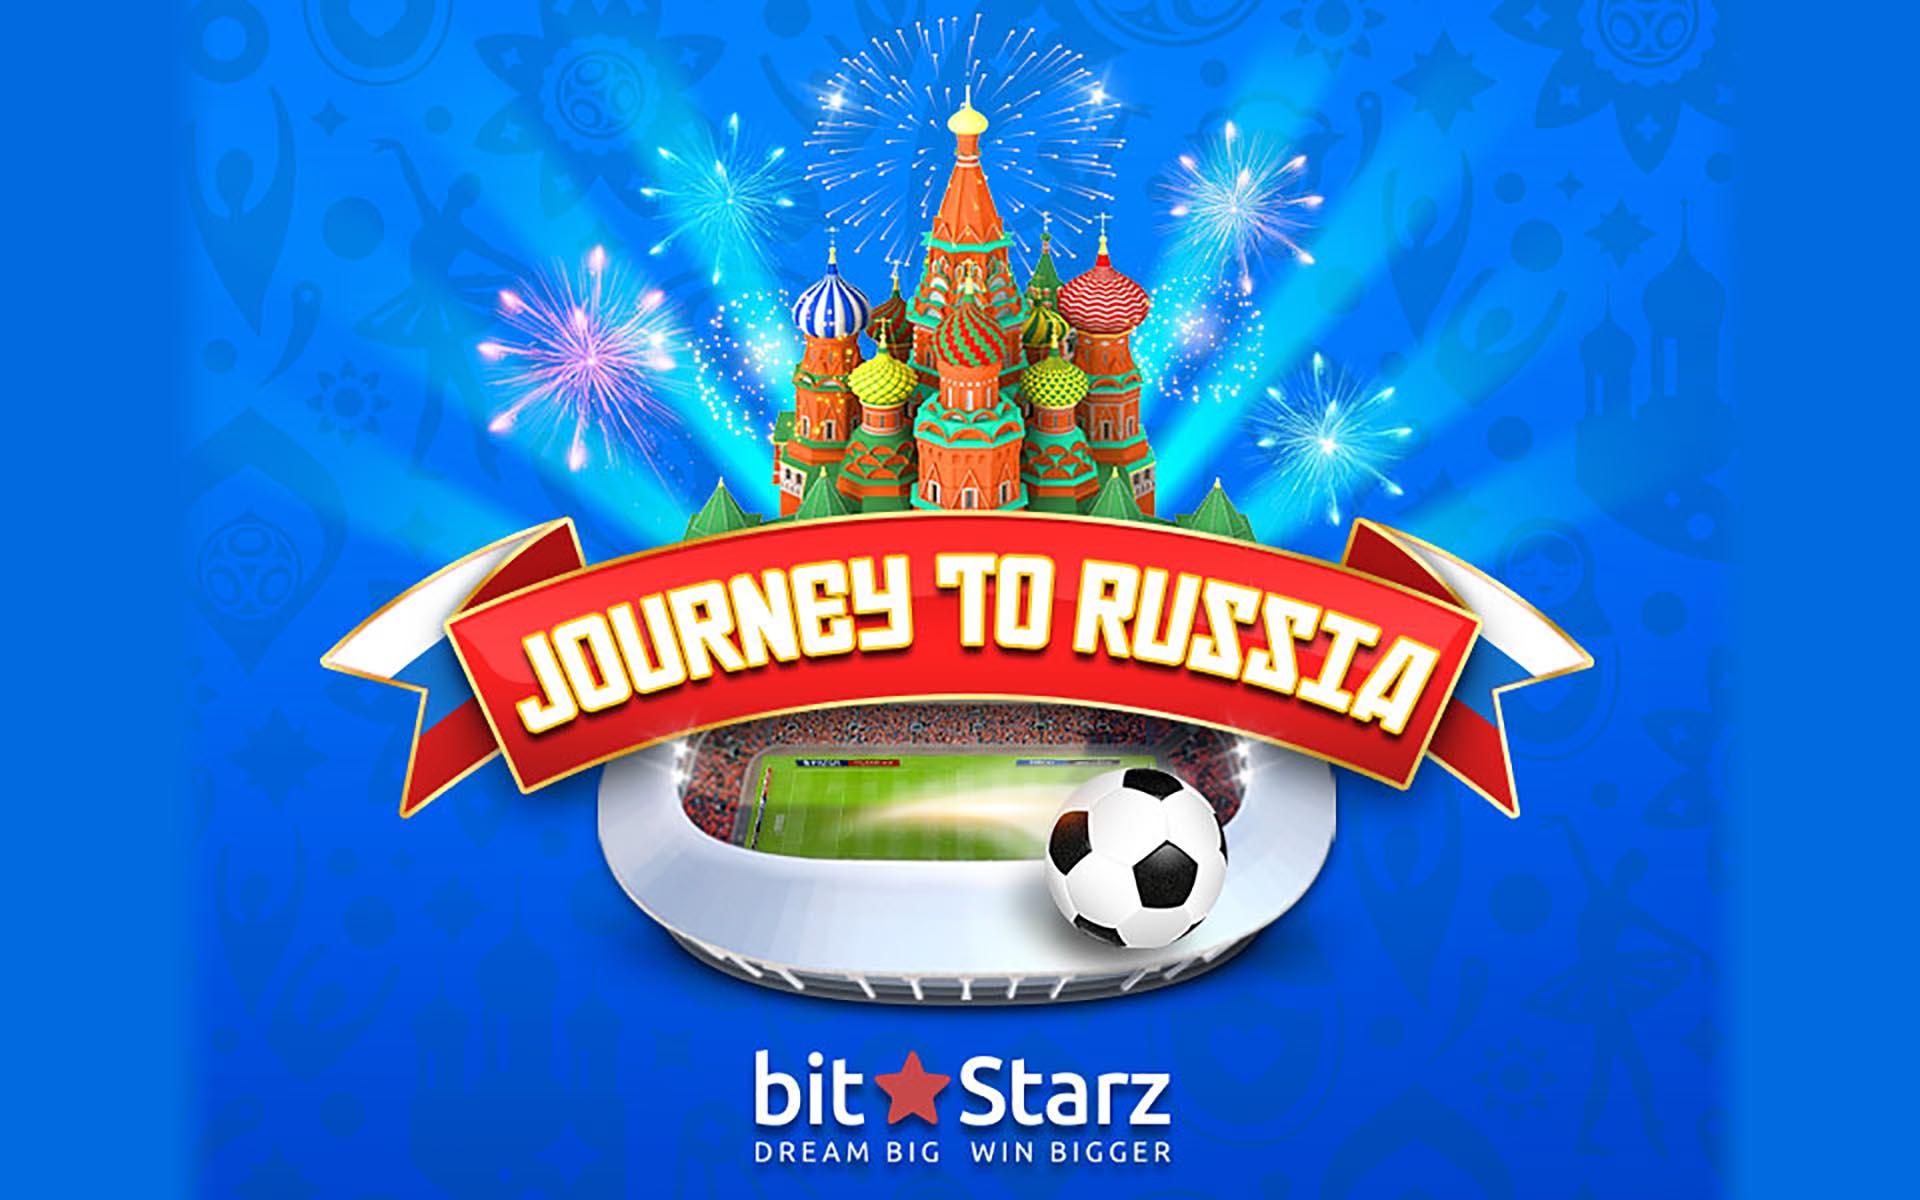 The Journey to Russia Has Begun at BitStarz!